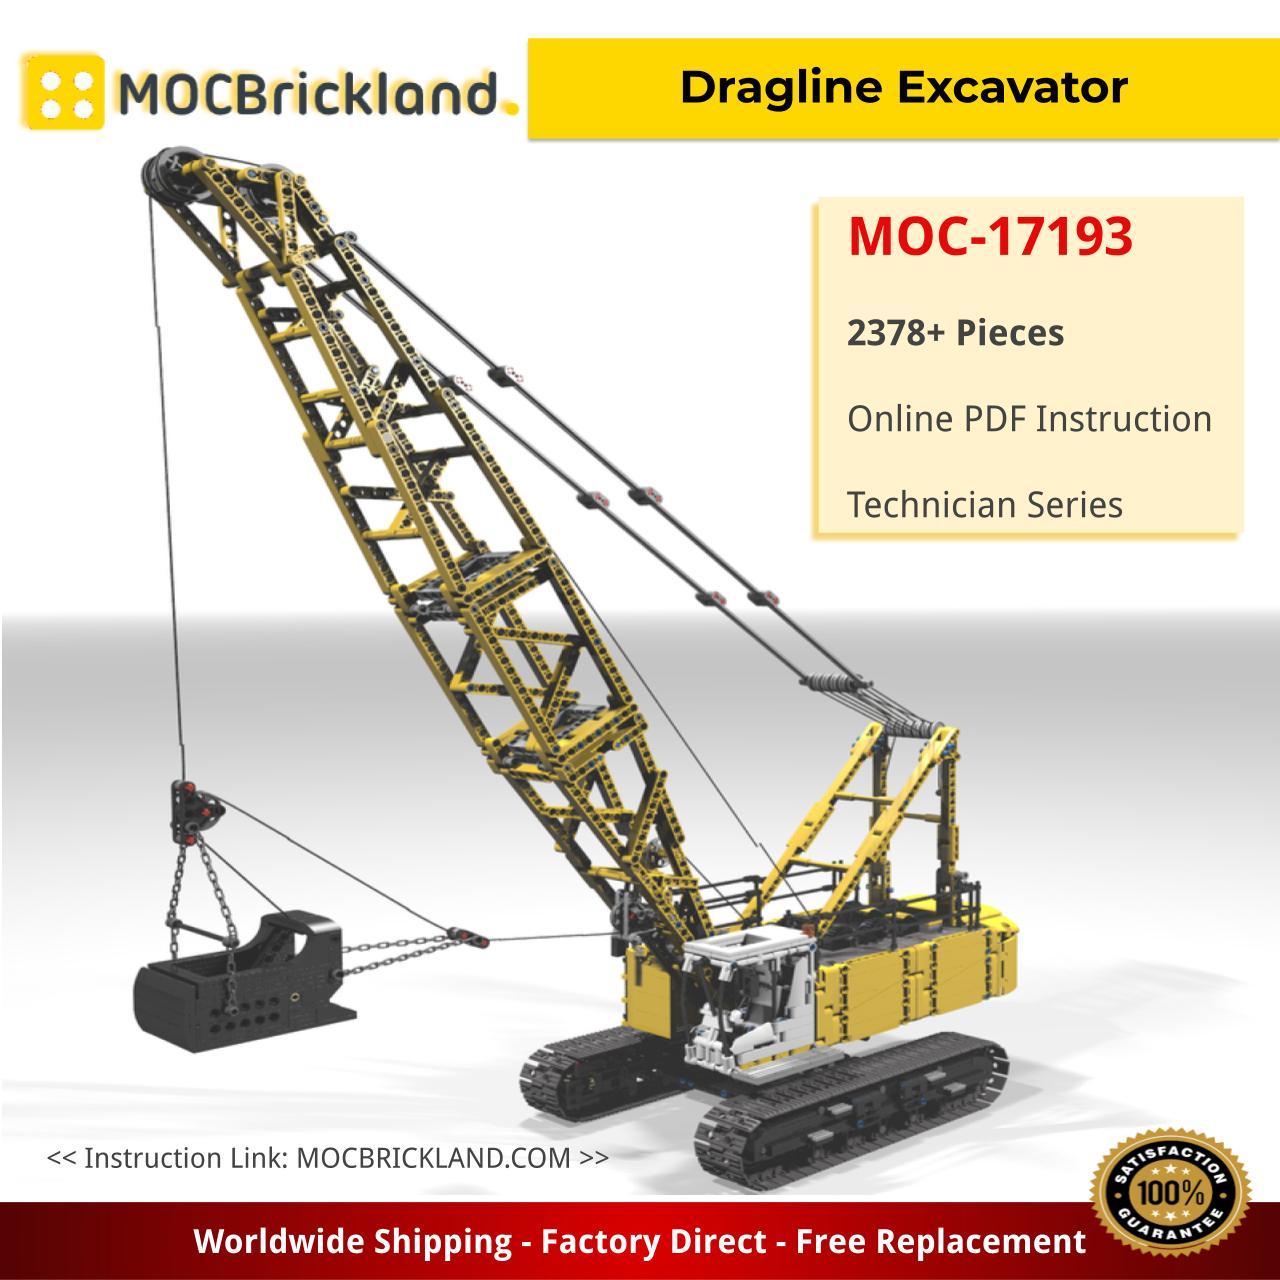 Dragline Excavator Technic MOC-17193 by Ivan_M with 2378 Pieces